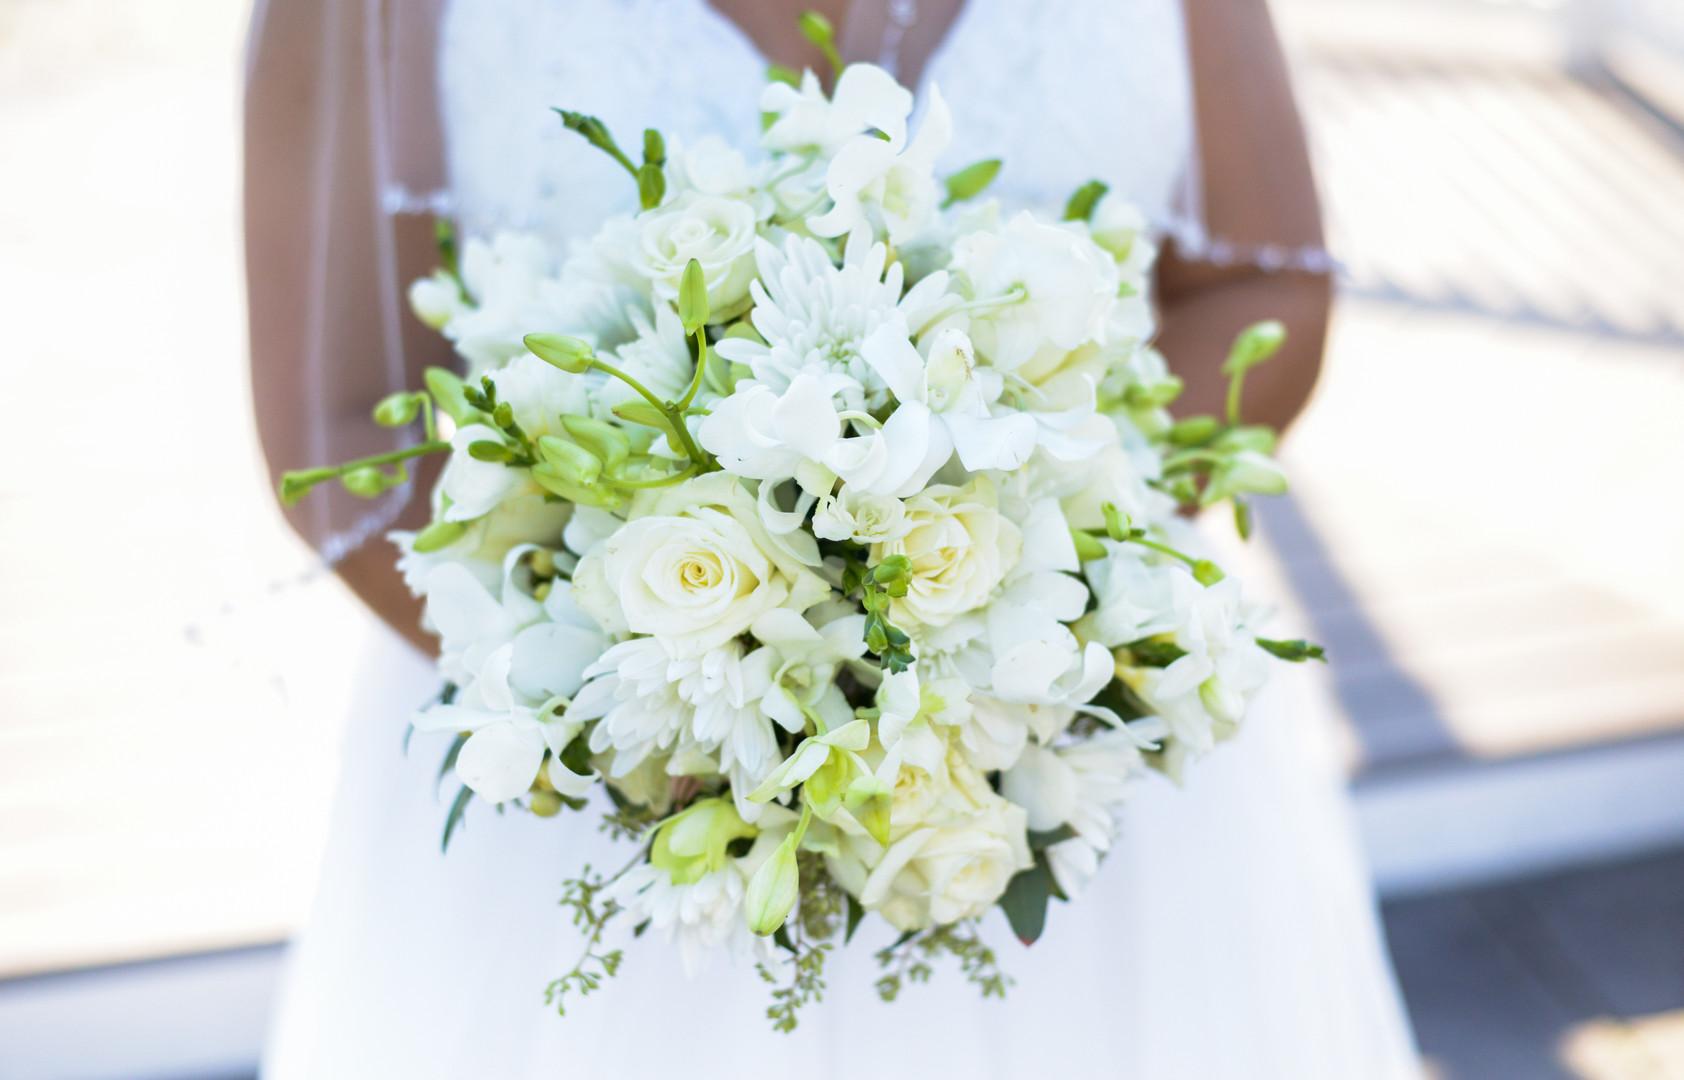 Melissa and Pete's Wedding - 37.jpg